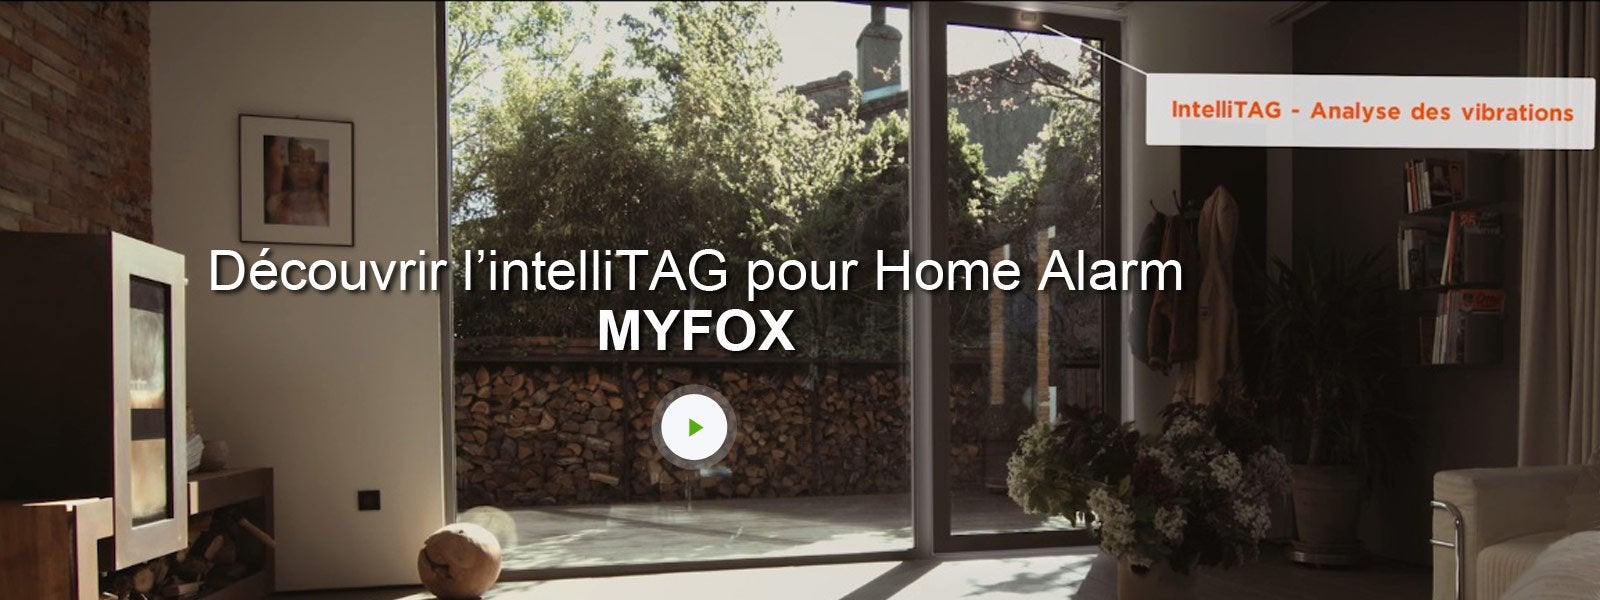 lot de 5 intellitag pour home alarm myfox leroy merlin. Black Bedroom Furniture Sets. Home Design Ideas